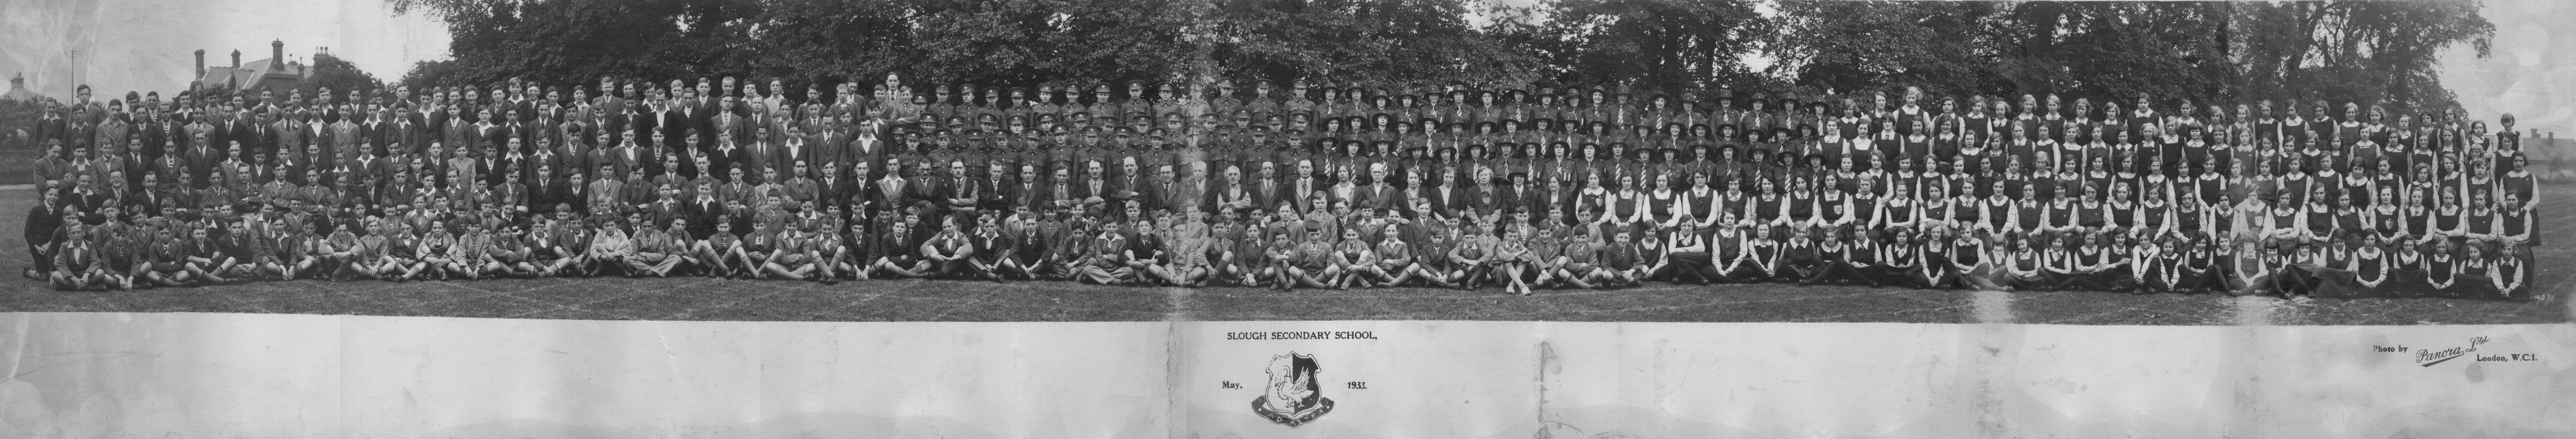 Slough Secondary School. 1933